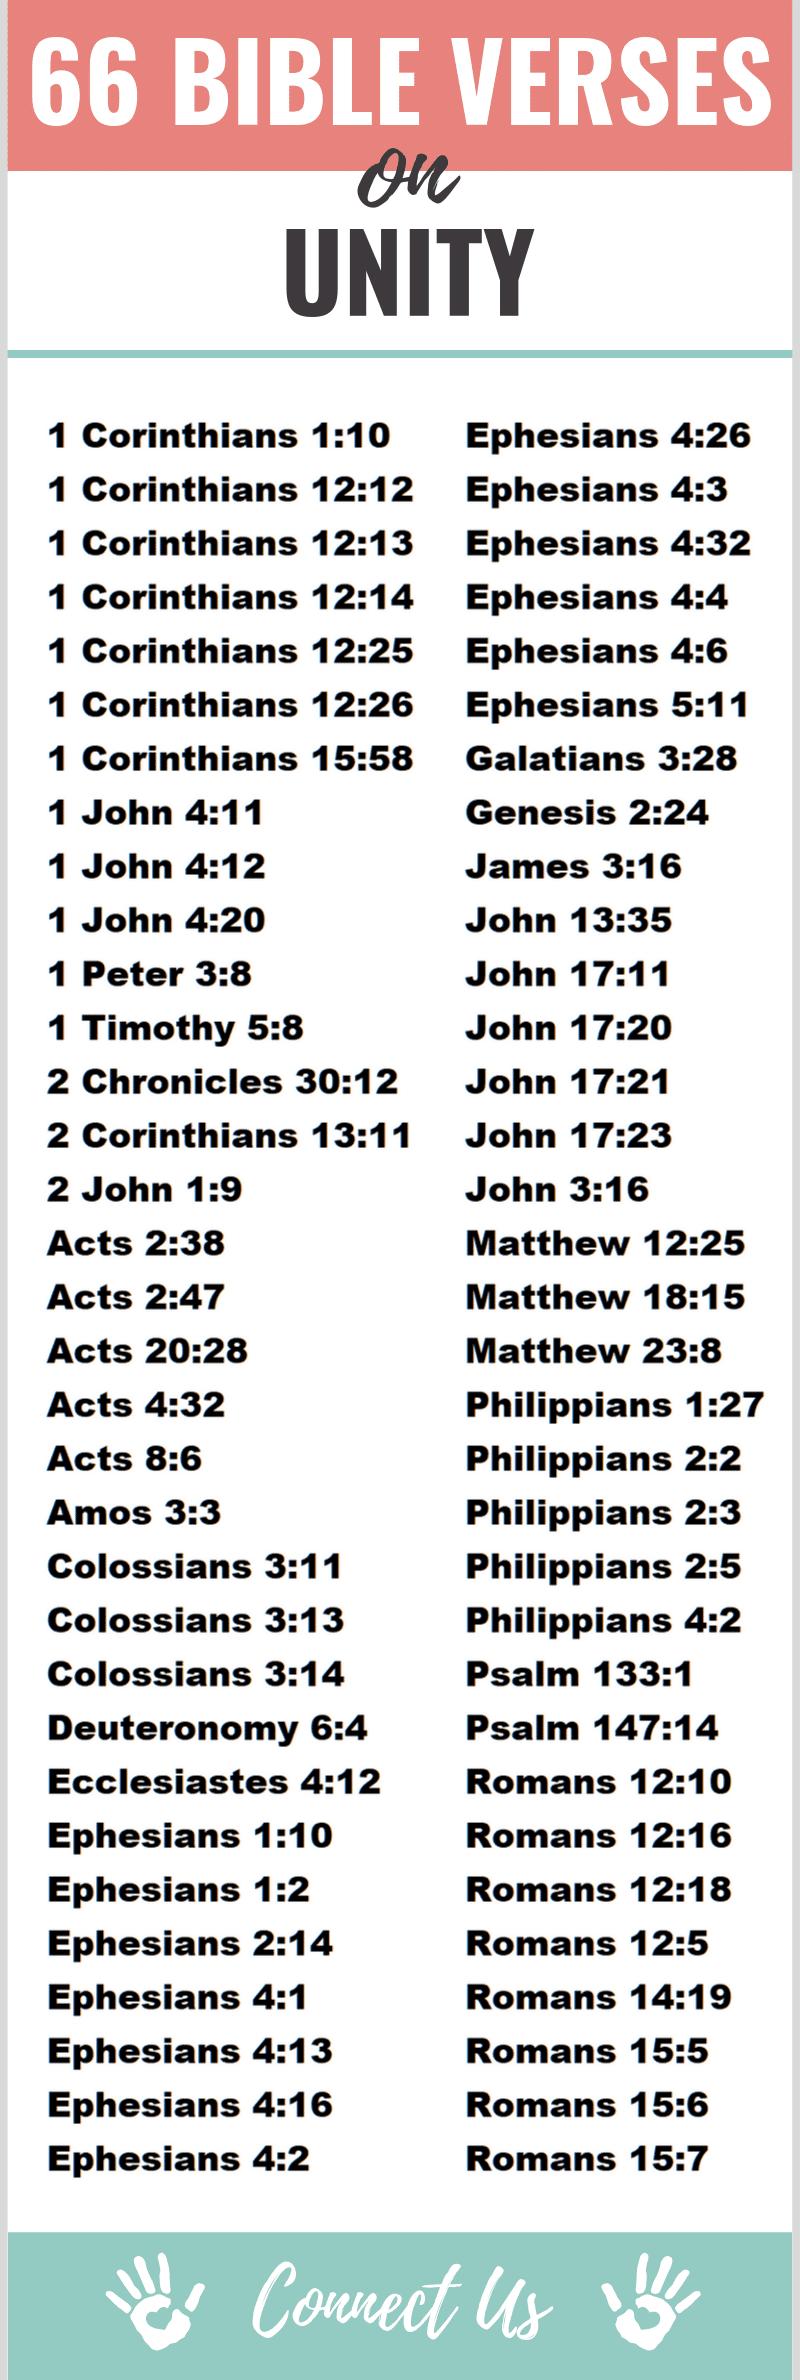 Bible Verses on Unity